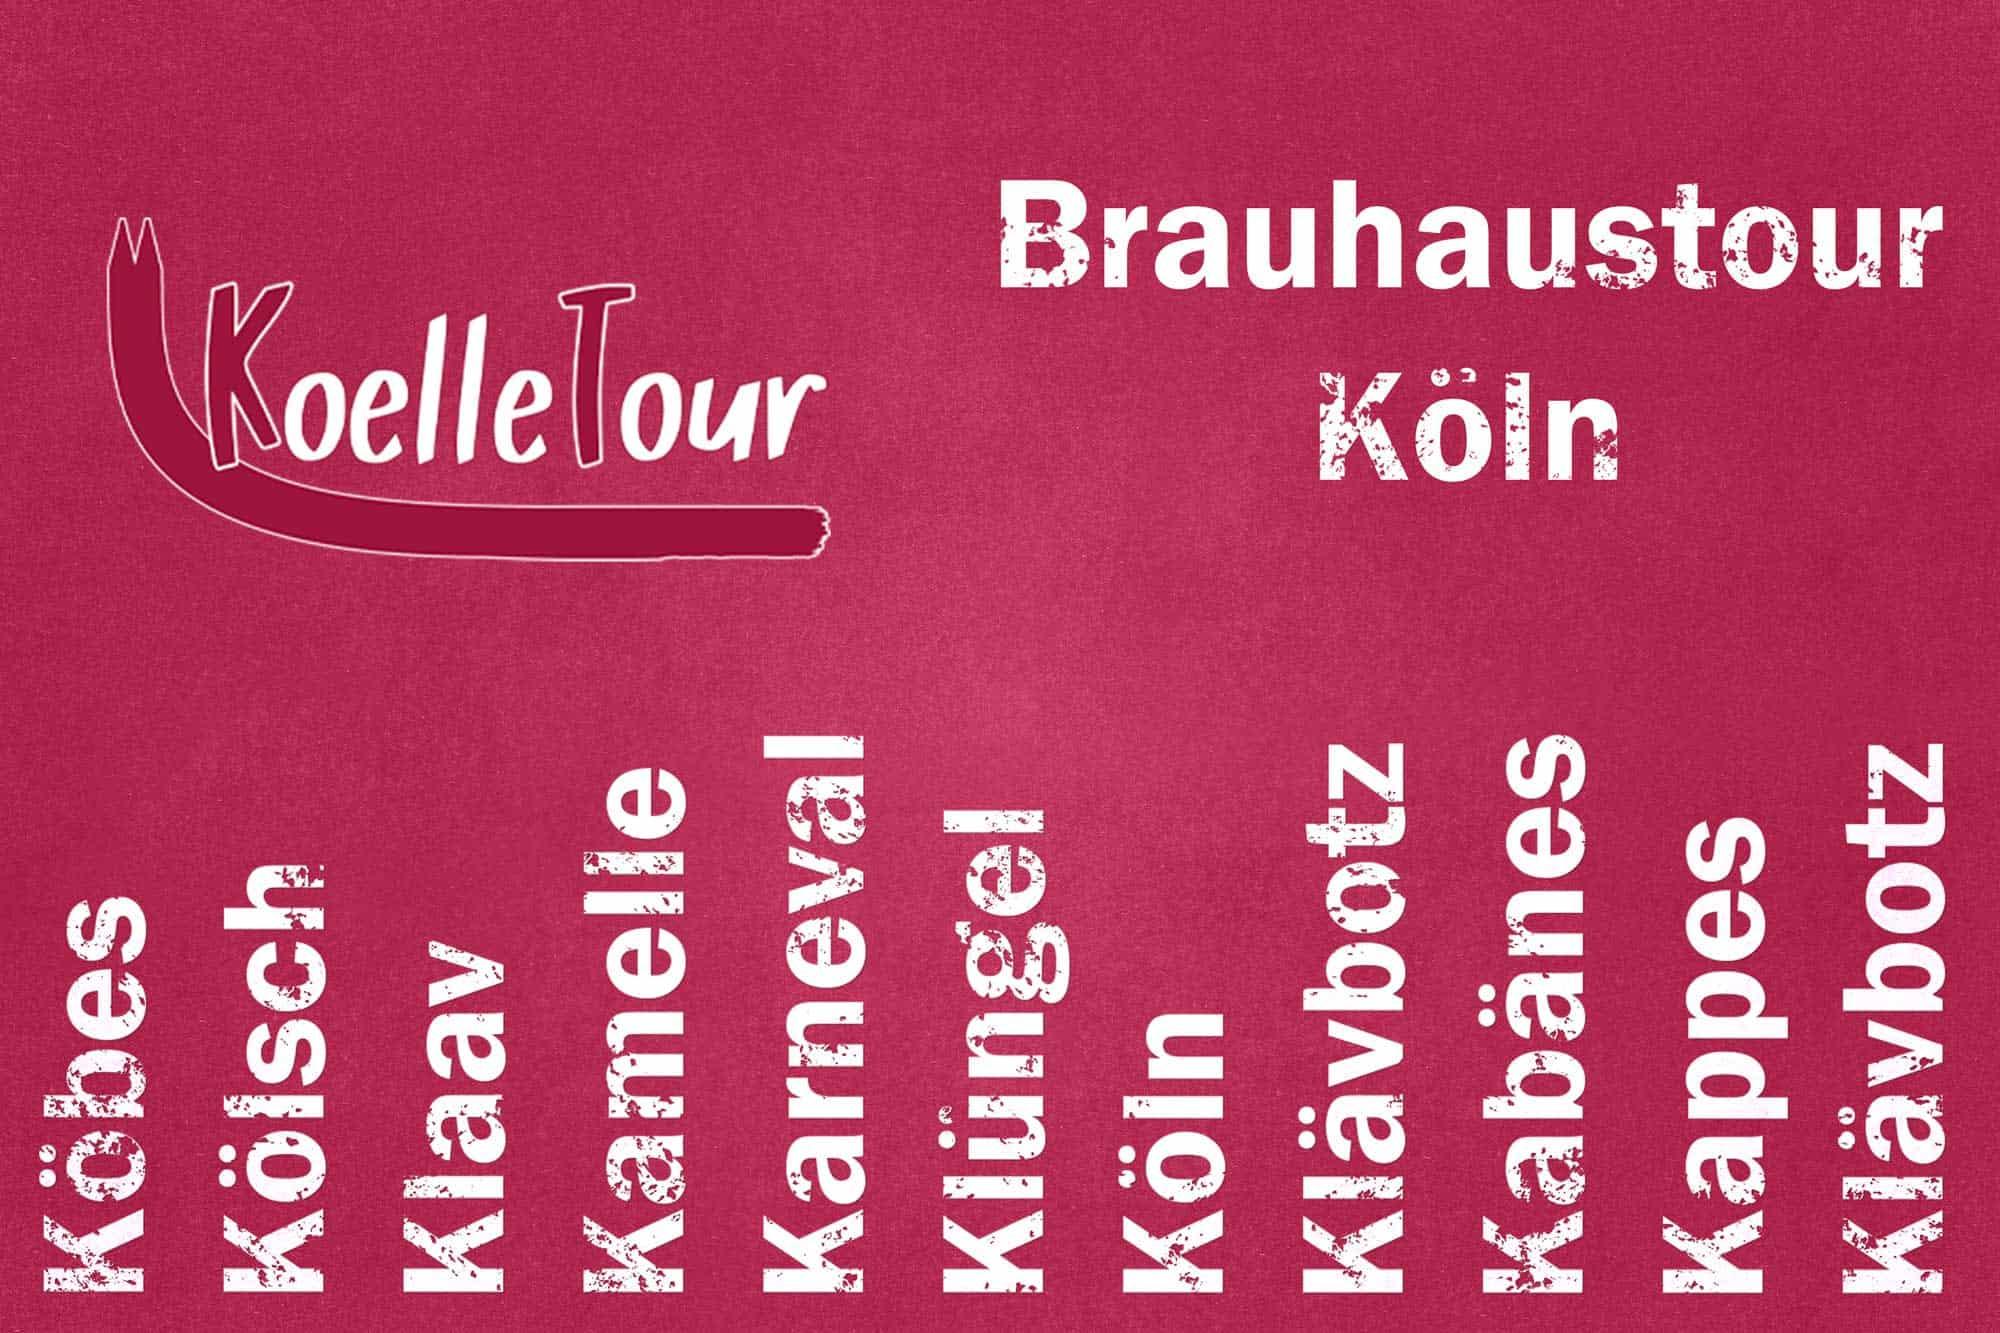 Brauhaustour Köln mit K